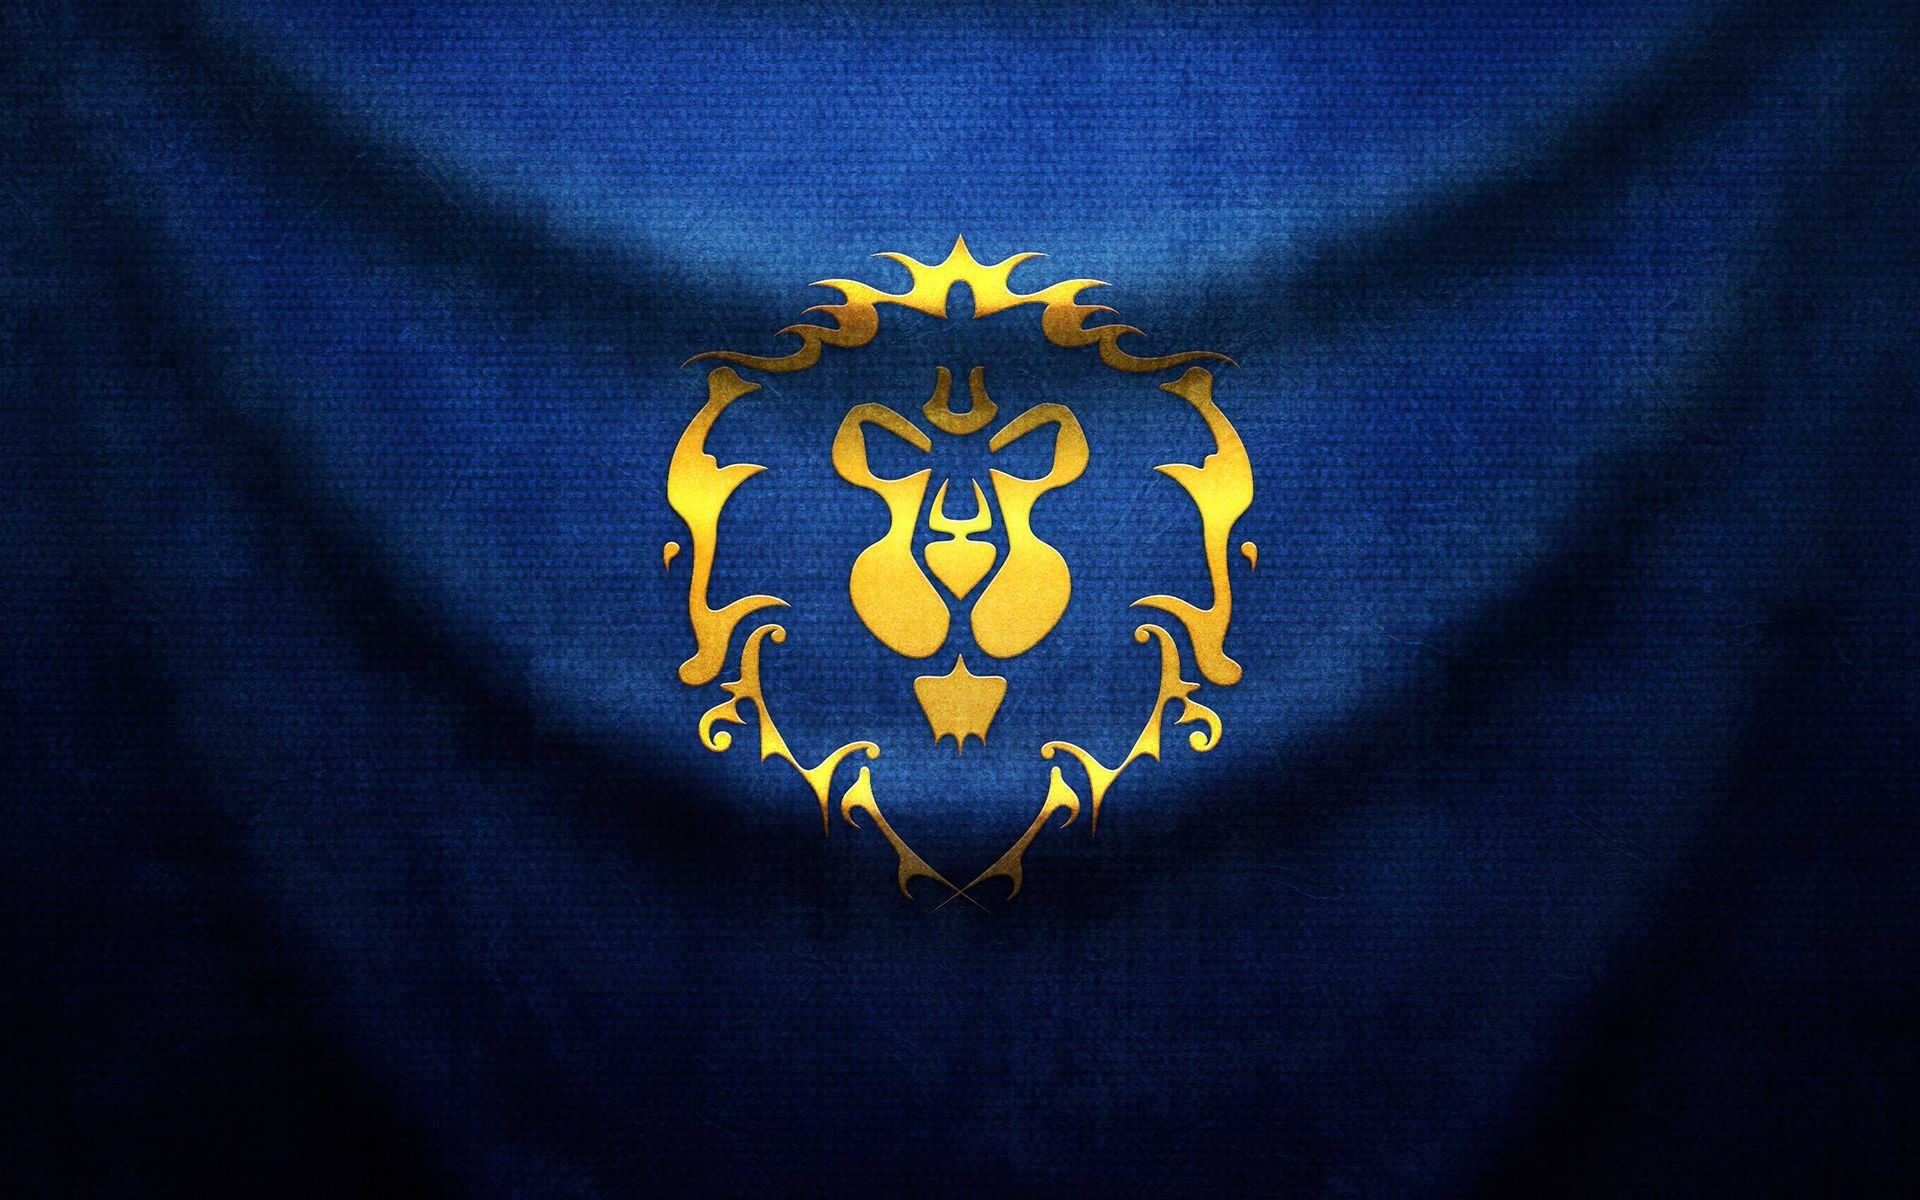 Alliance World Of Warcraft Wallpaper World Of Warcraft Wallpaper World Of Warcraft Game World Of Warcraft